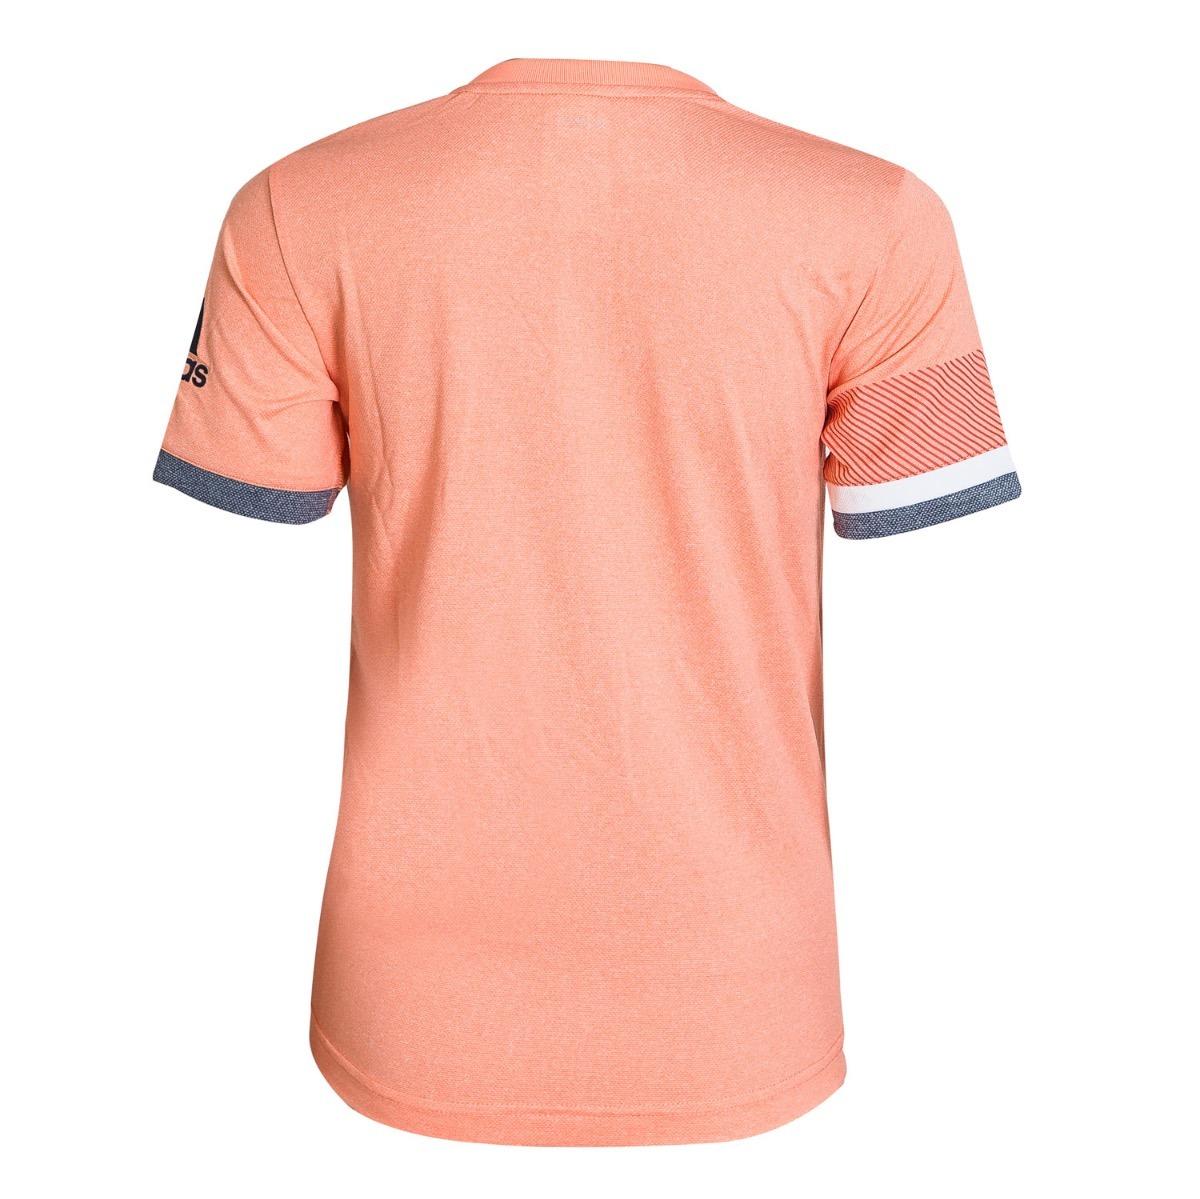 Playera Polo adidas Roland Garros -   1 30b72ee6c8761